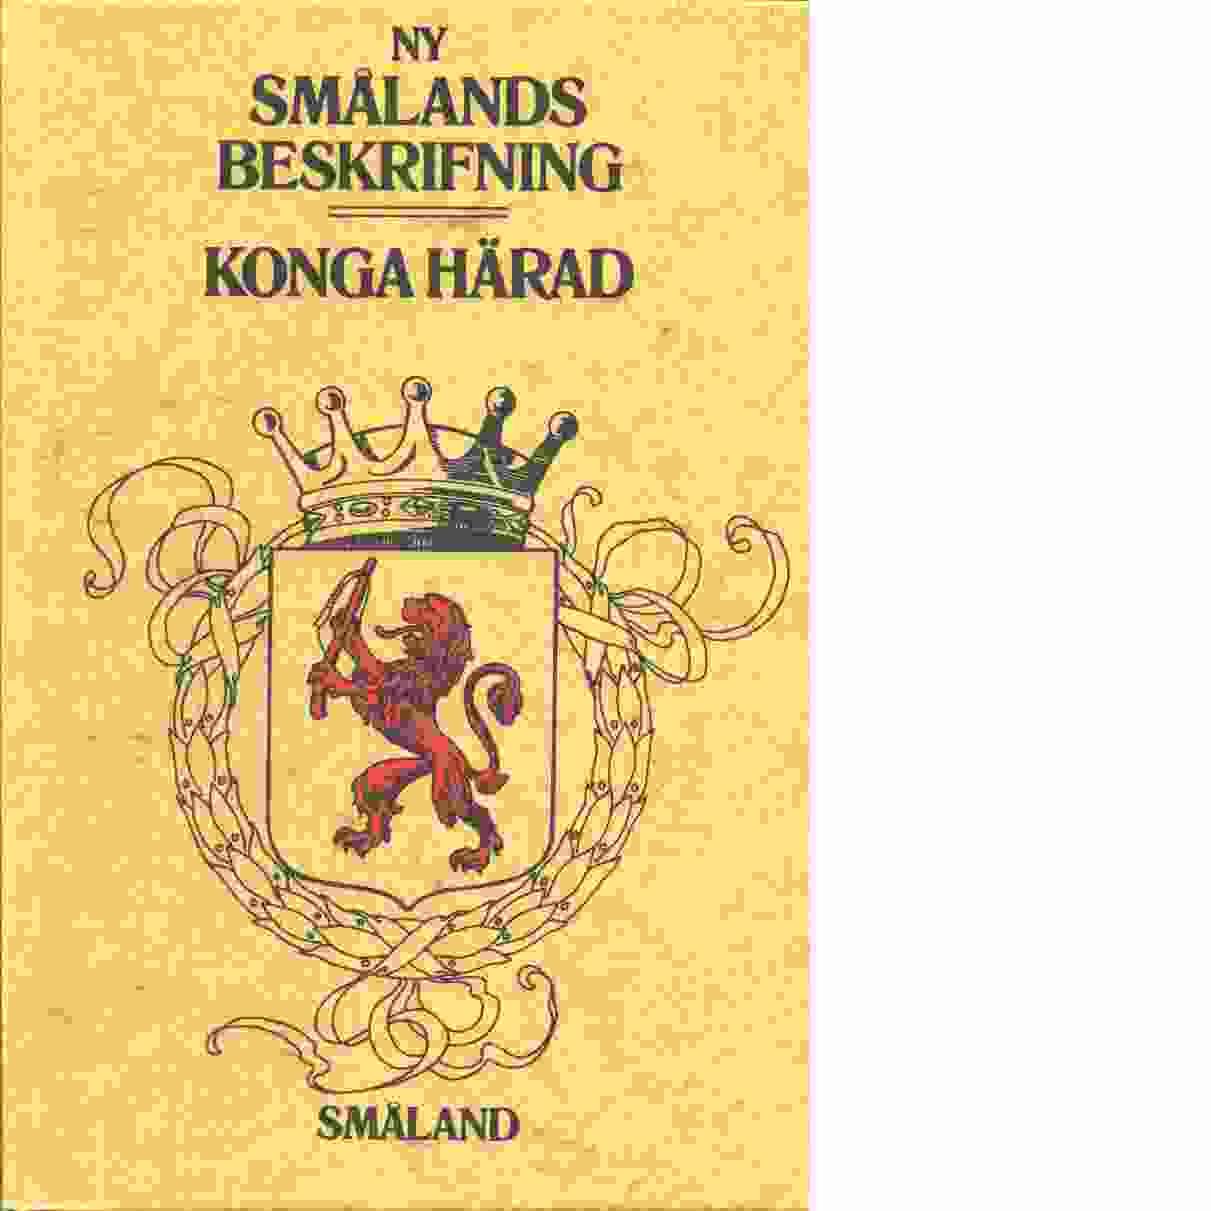 Konga härad - Rosengren, Josef